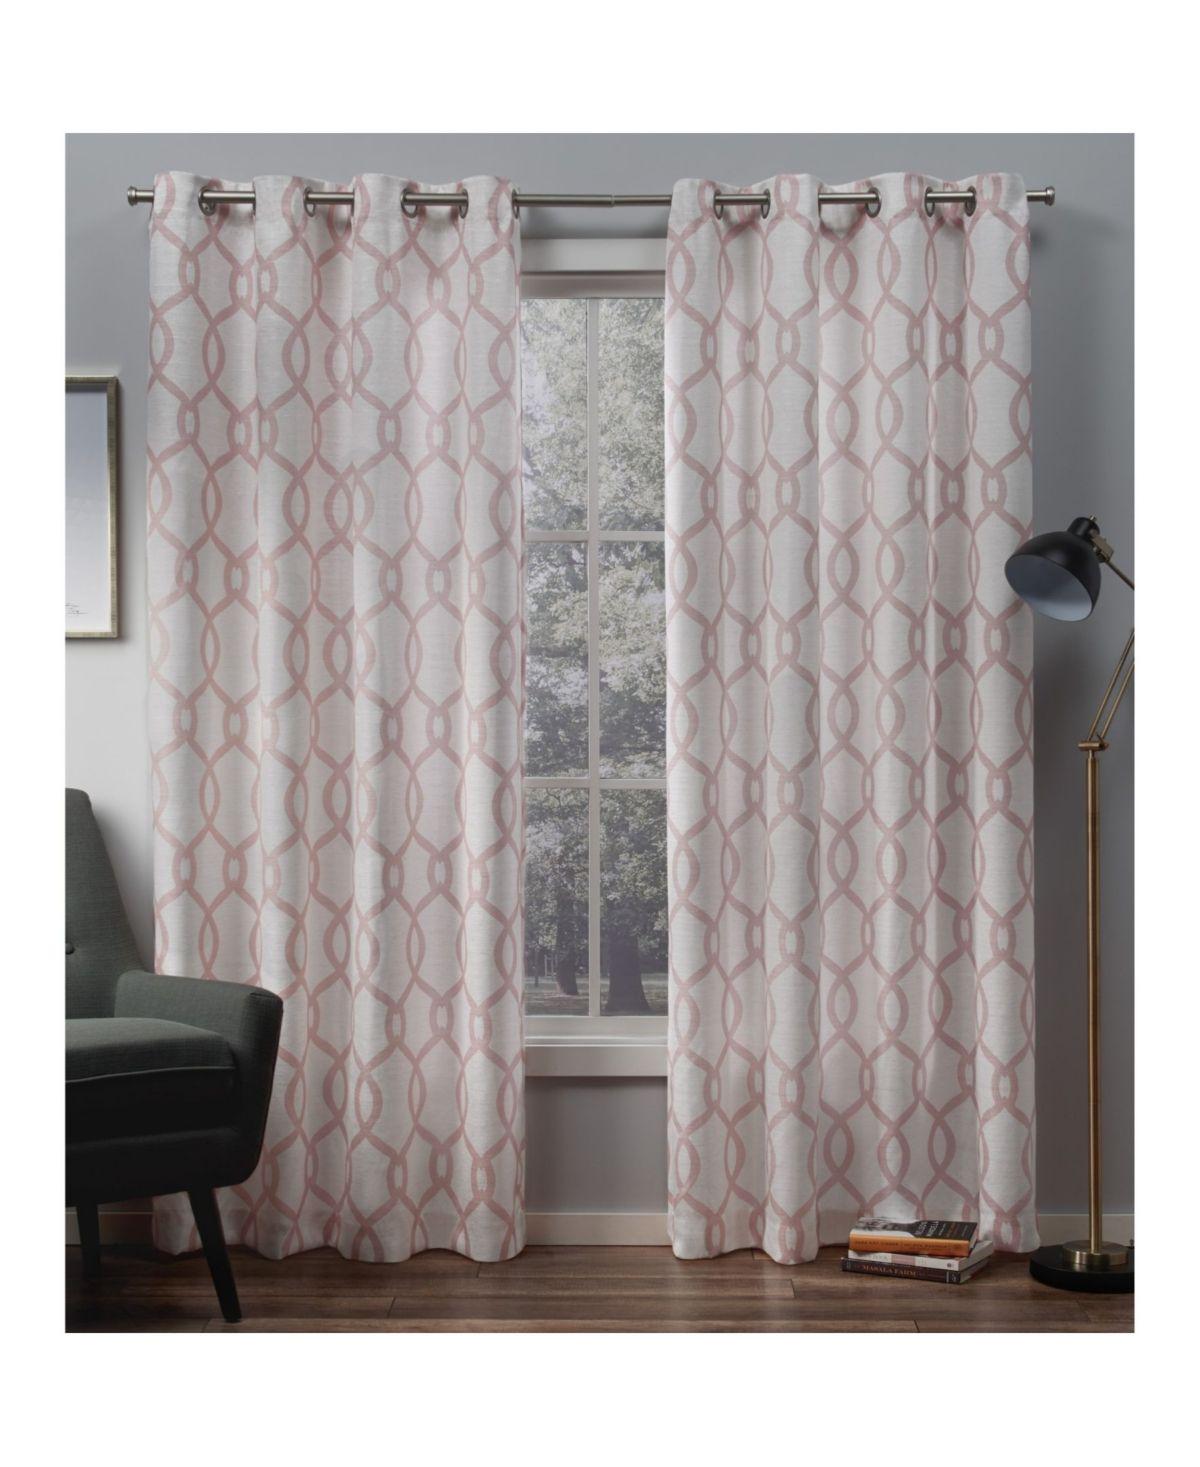 Exclusive Home Kochi Linen Blend Grommet Top Curtain Panel Pair